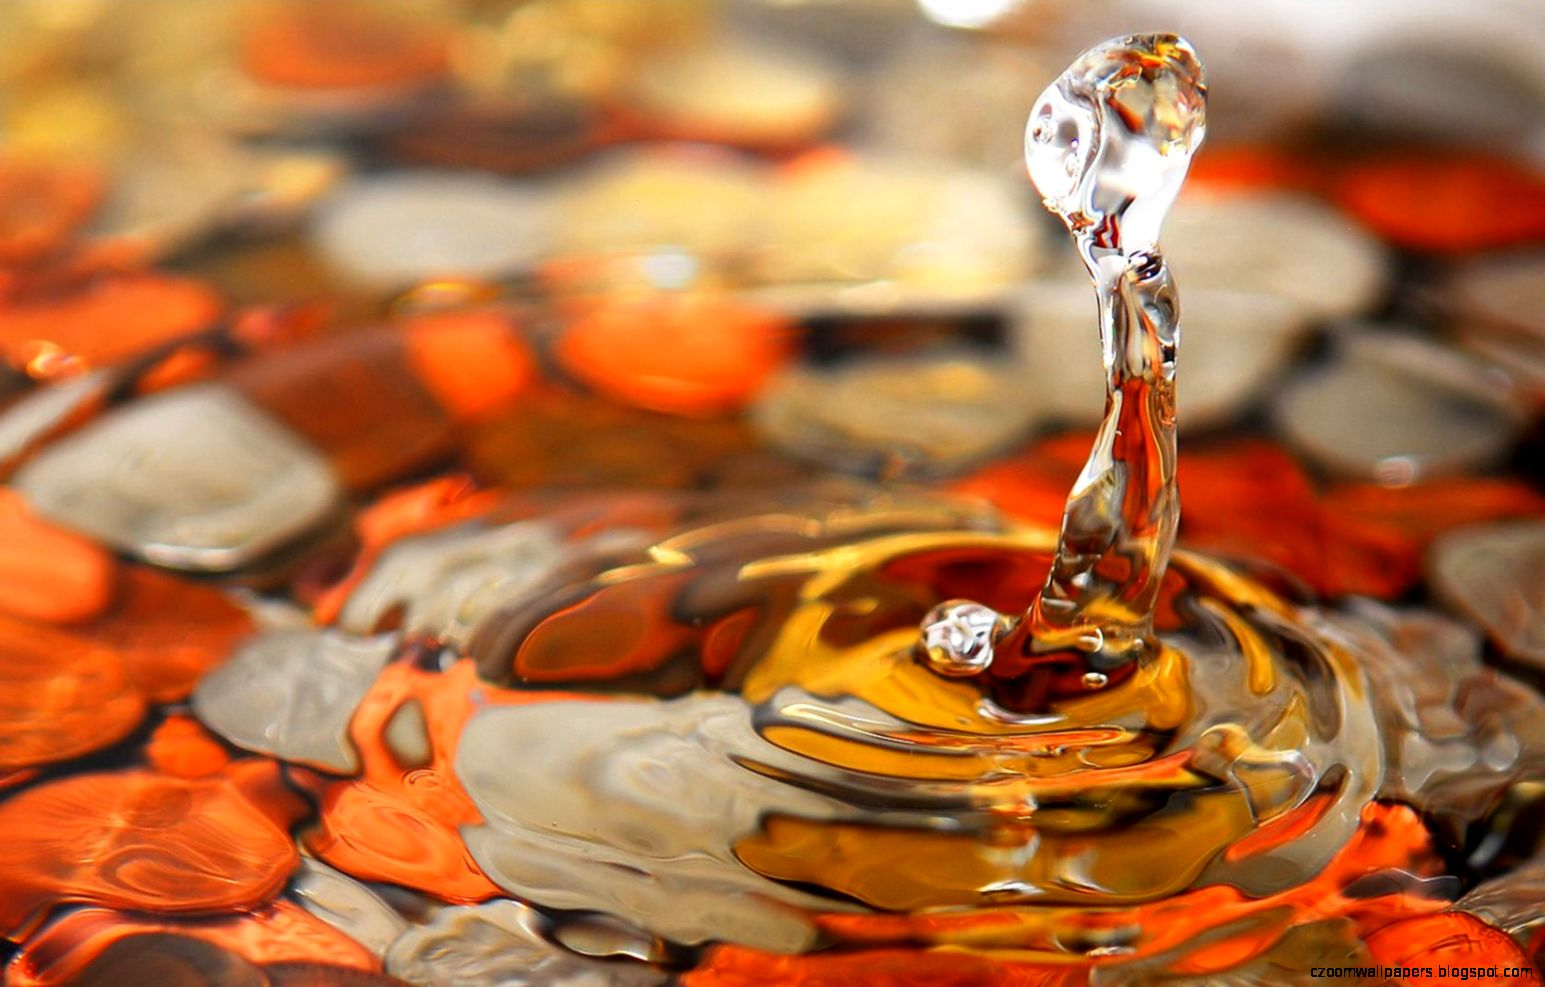 Water Drop HD Wallpapers